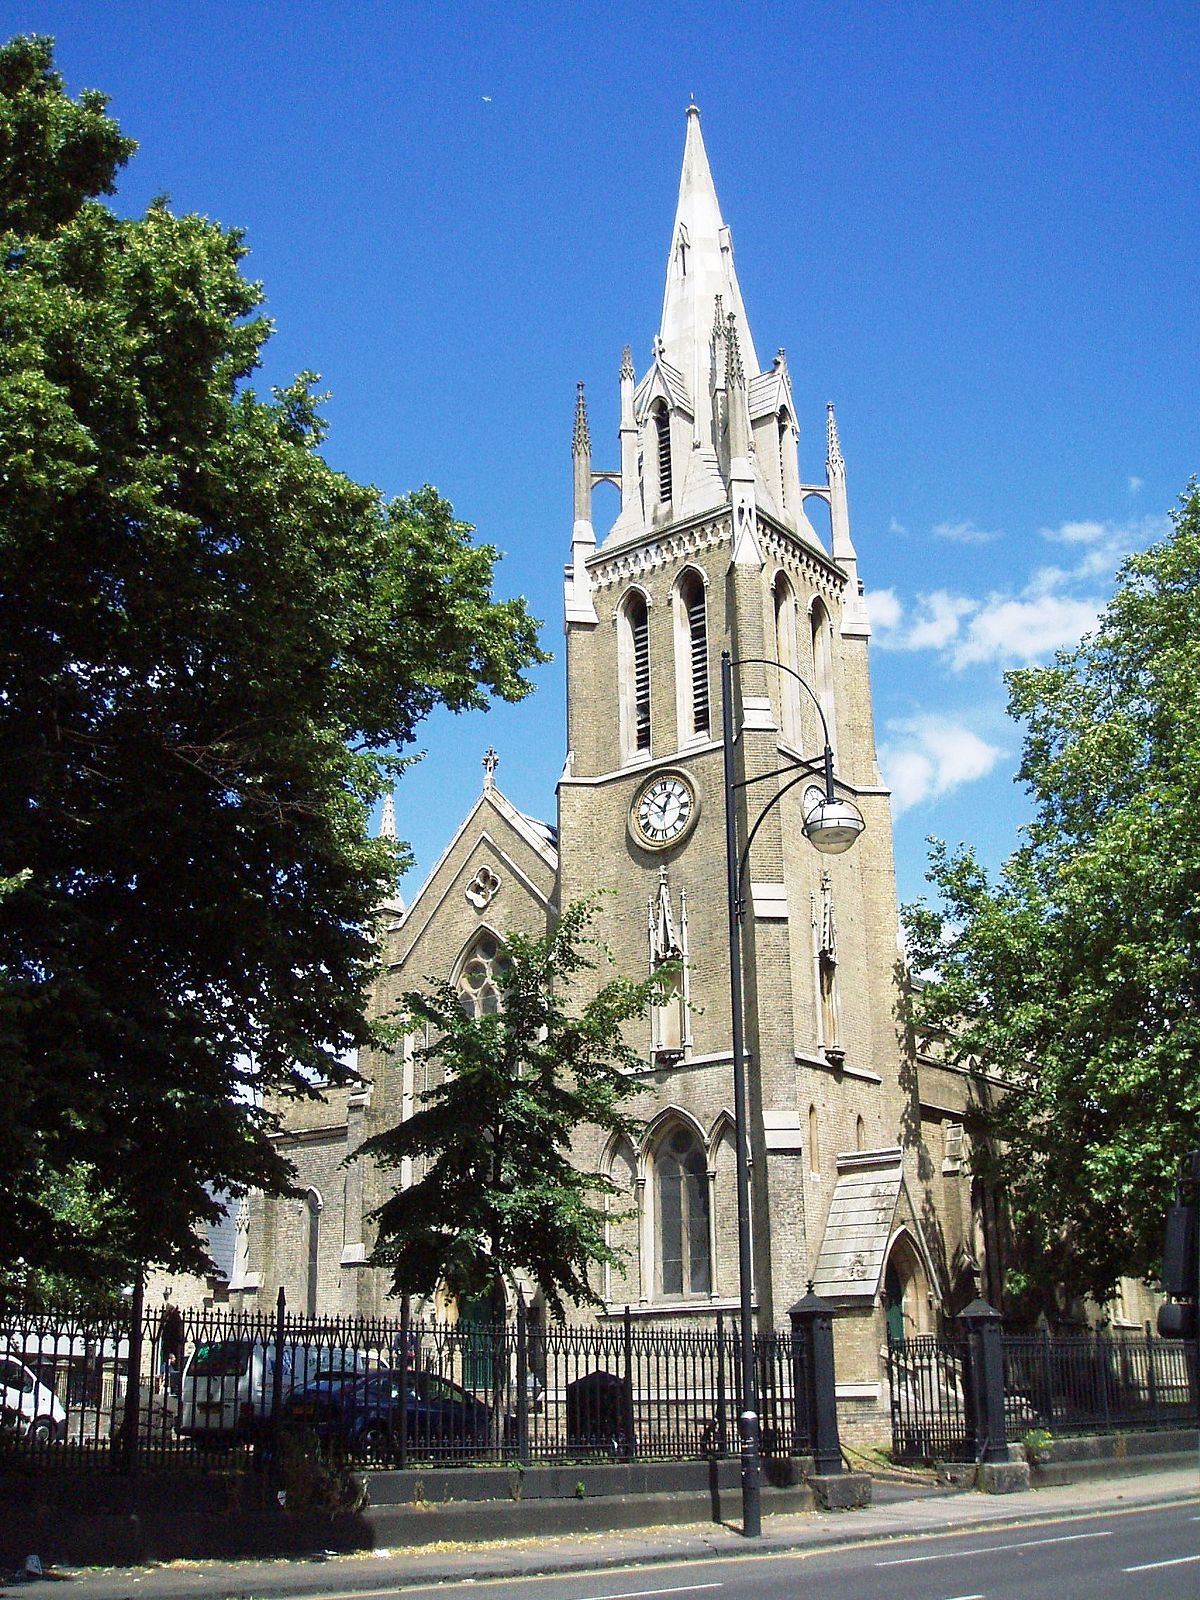 St john 39 s church stratford wikipedia for The stratford